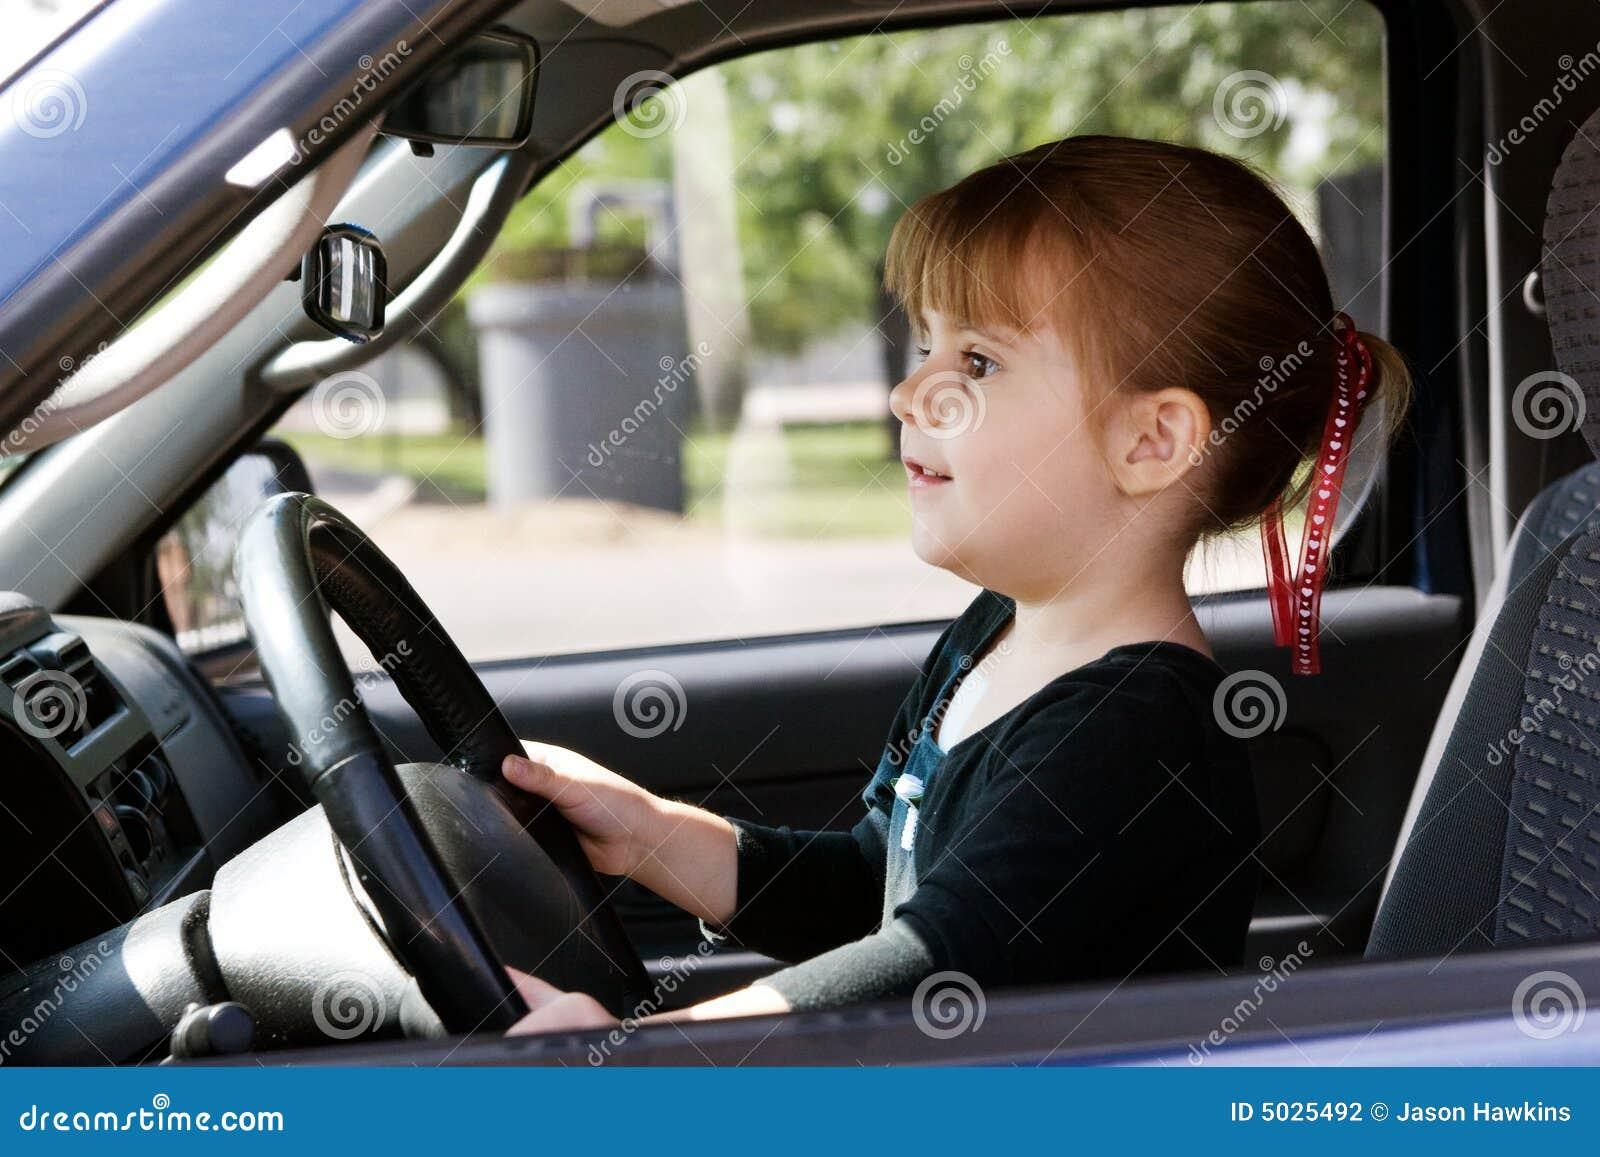 naked mature women driving